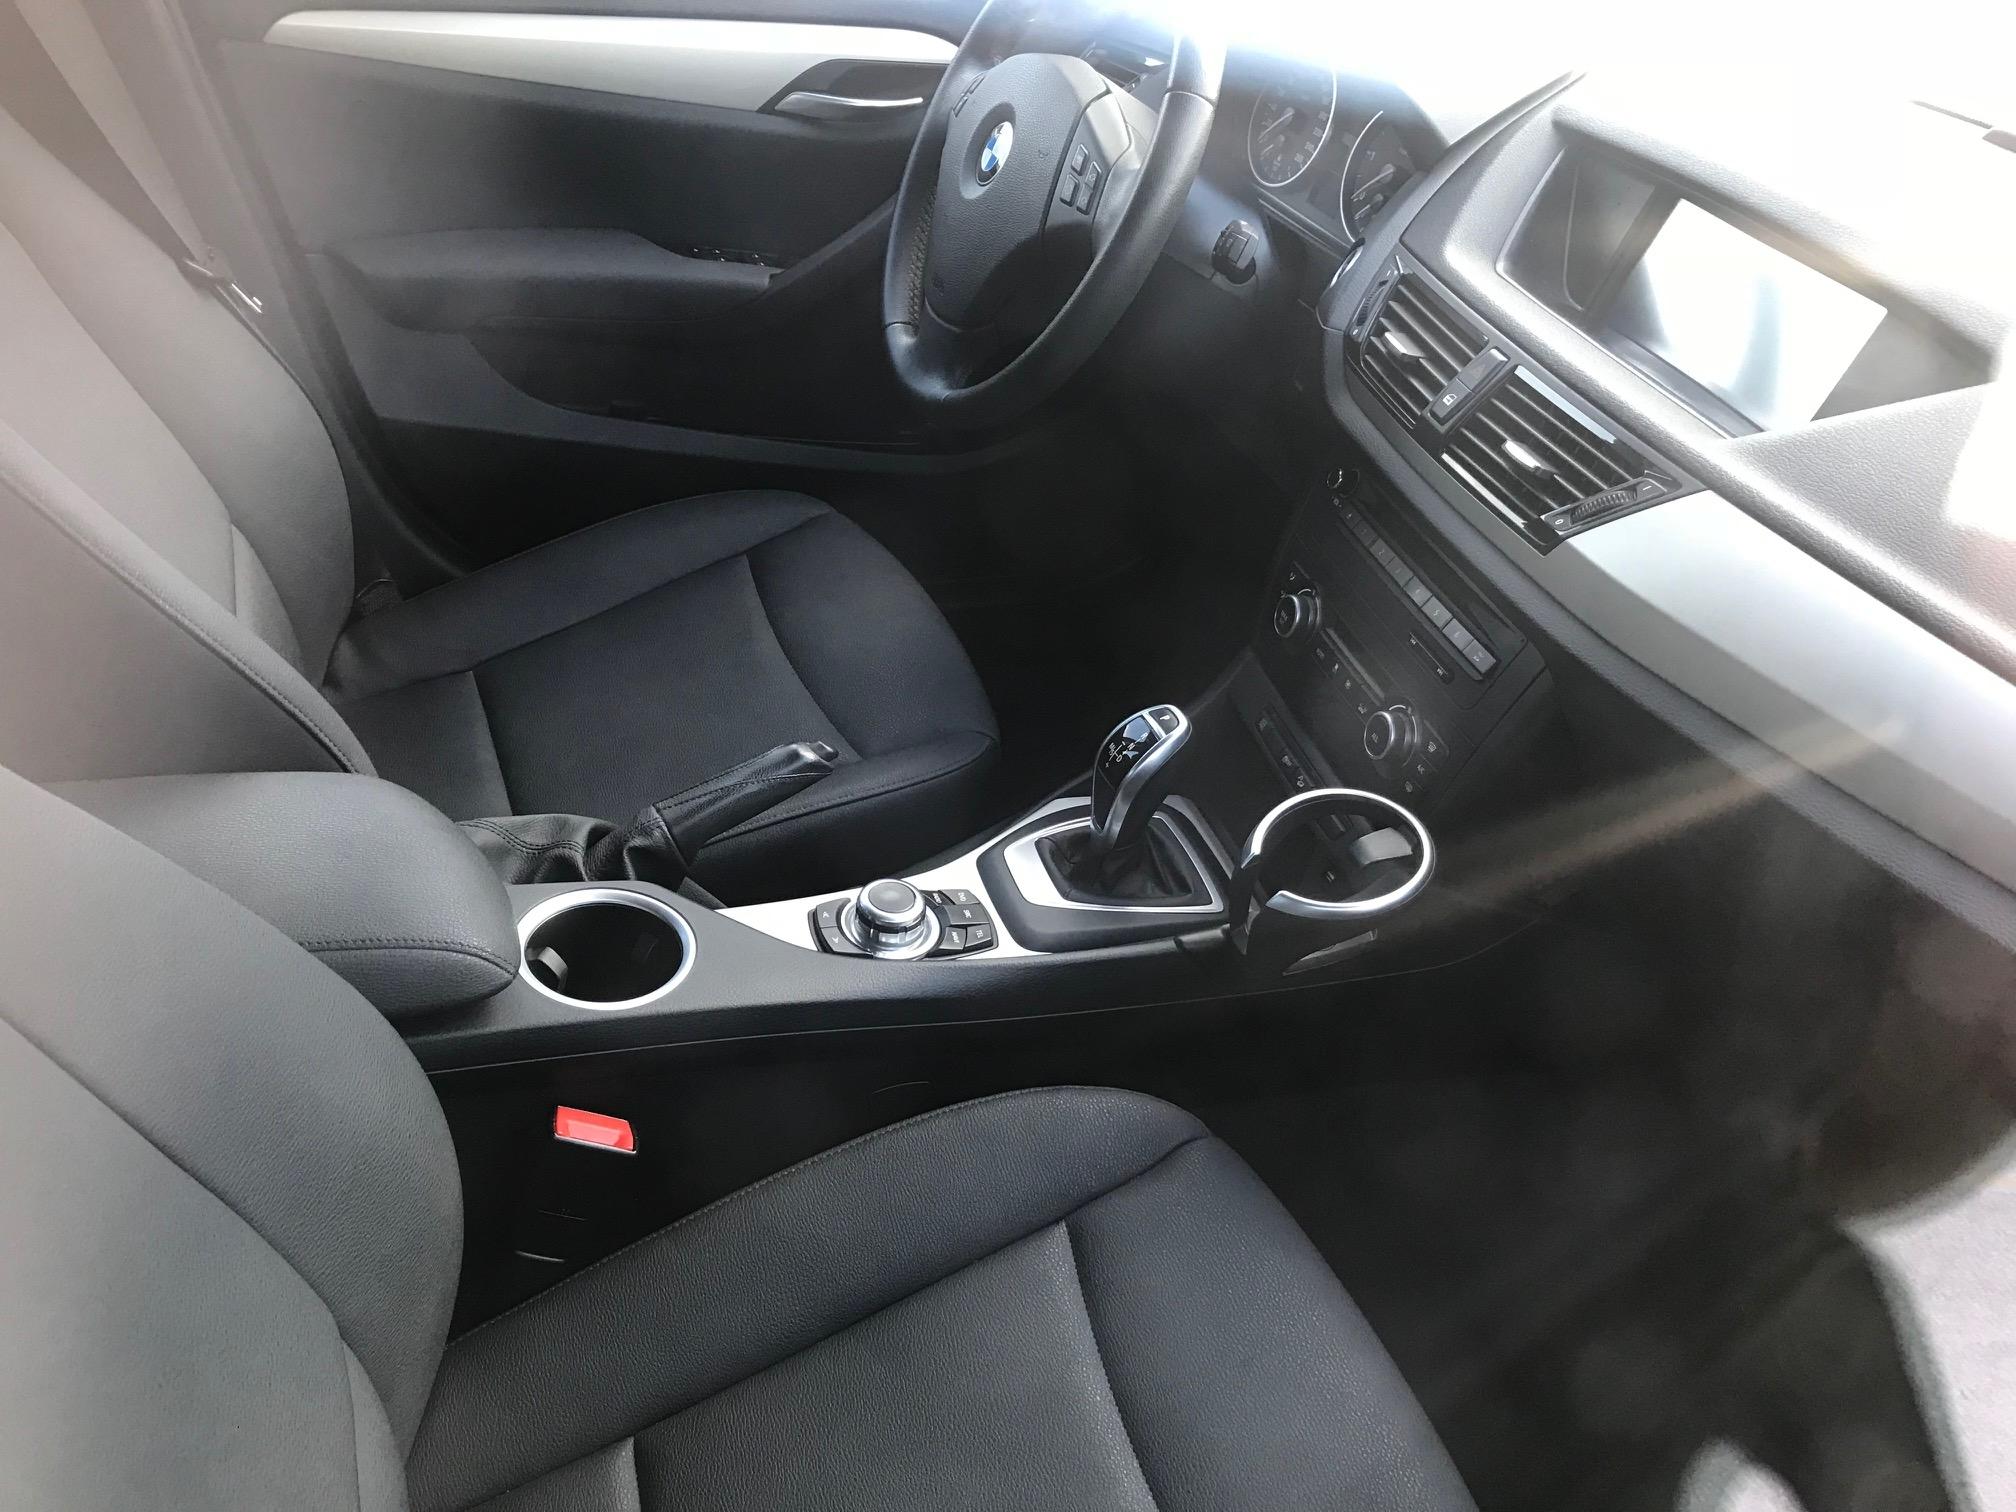 BMW X1 2000cc DIESEL AUTO 4X4